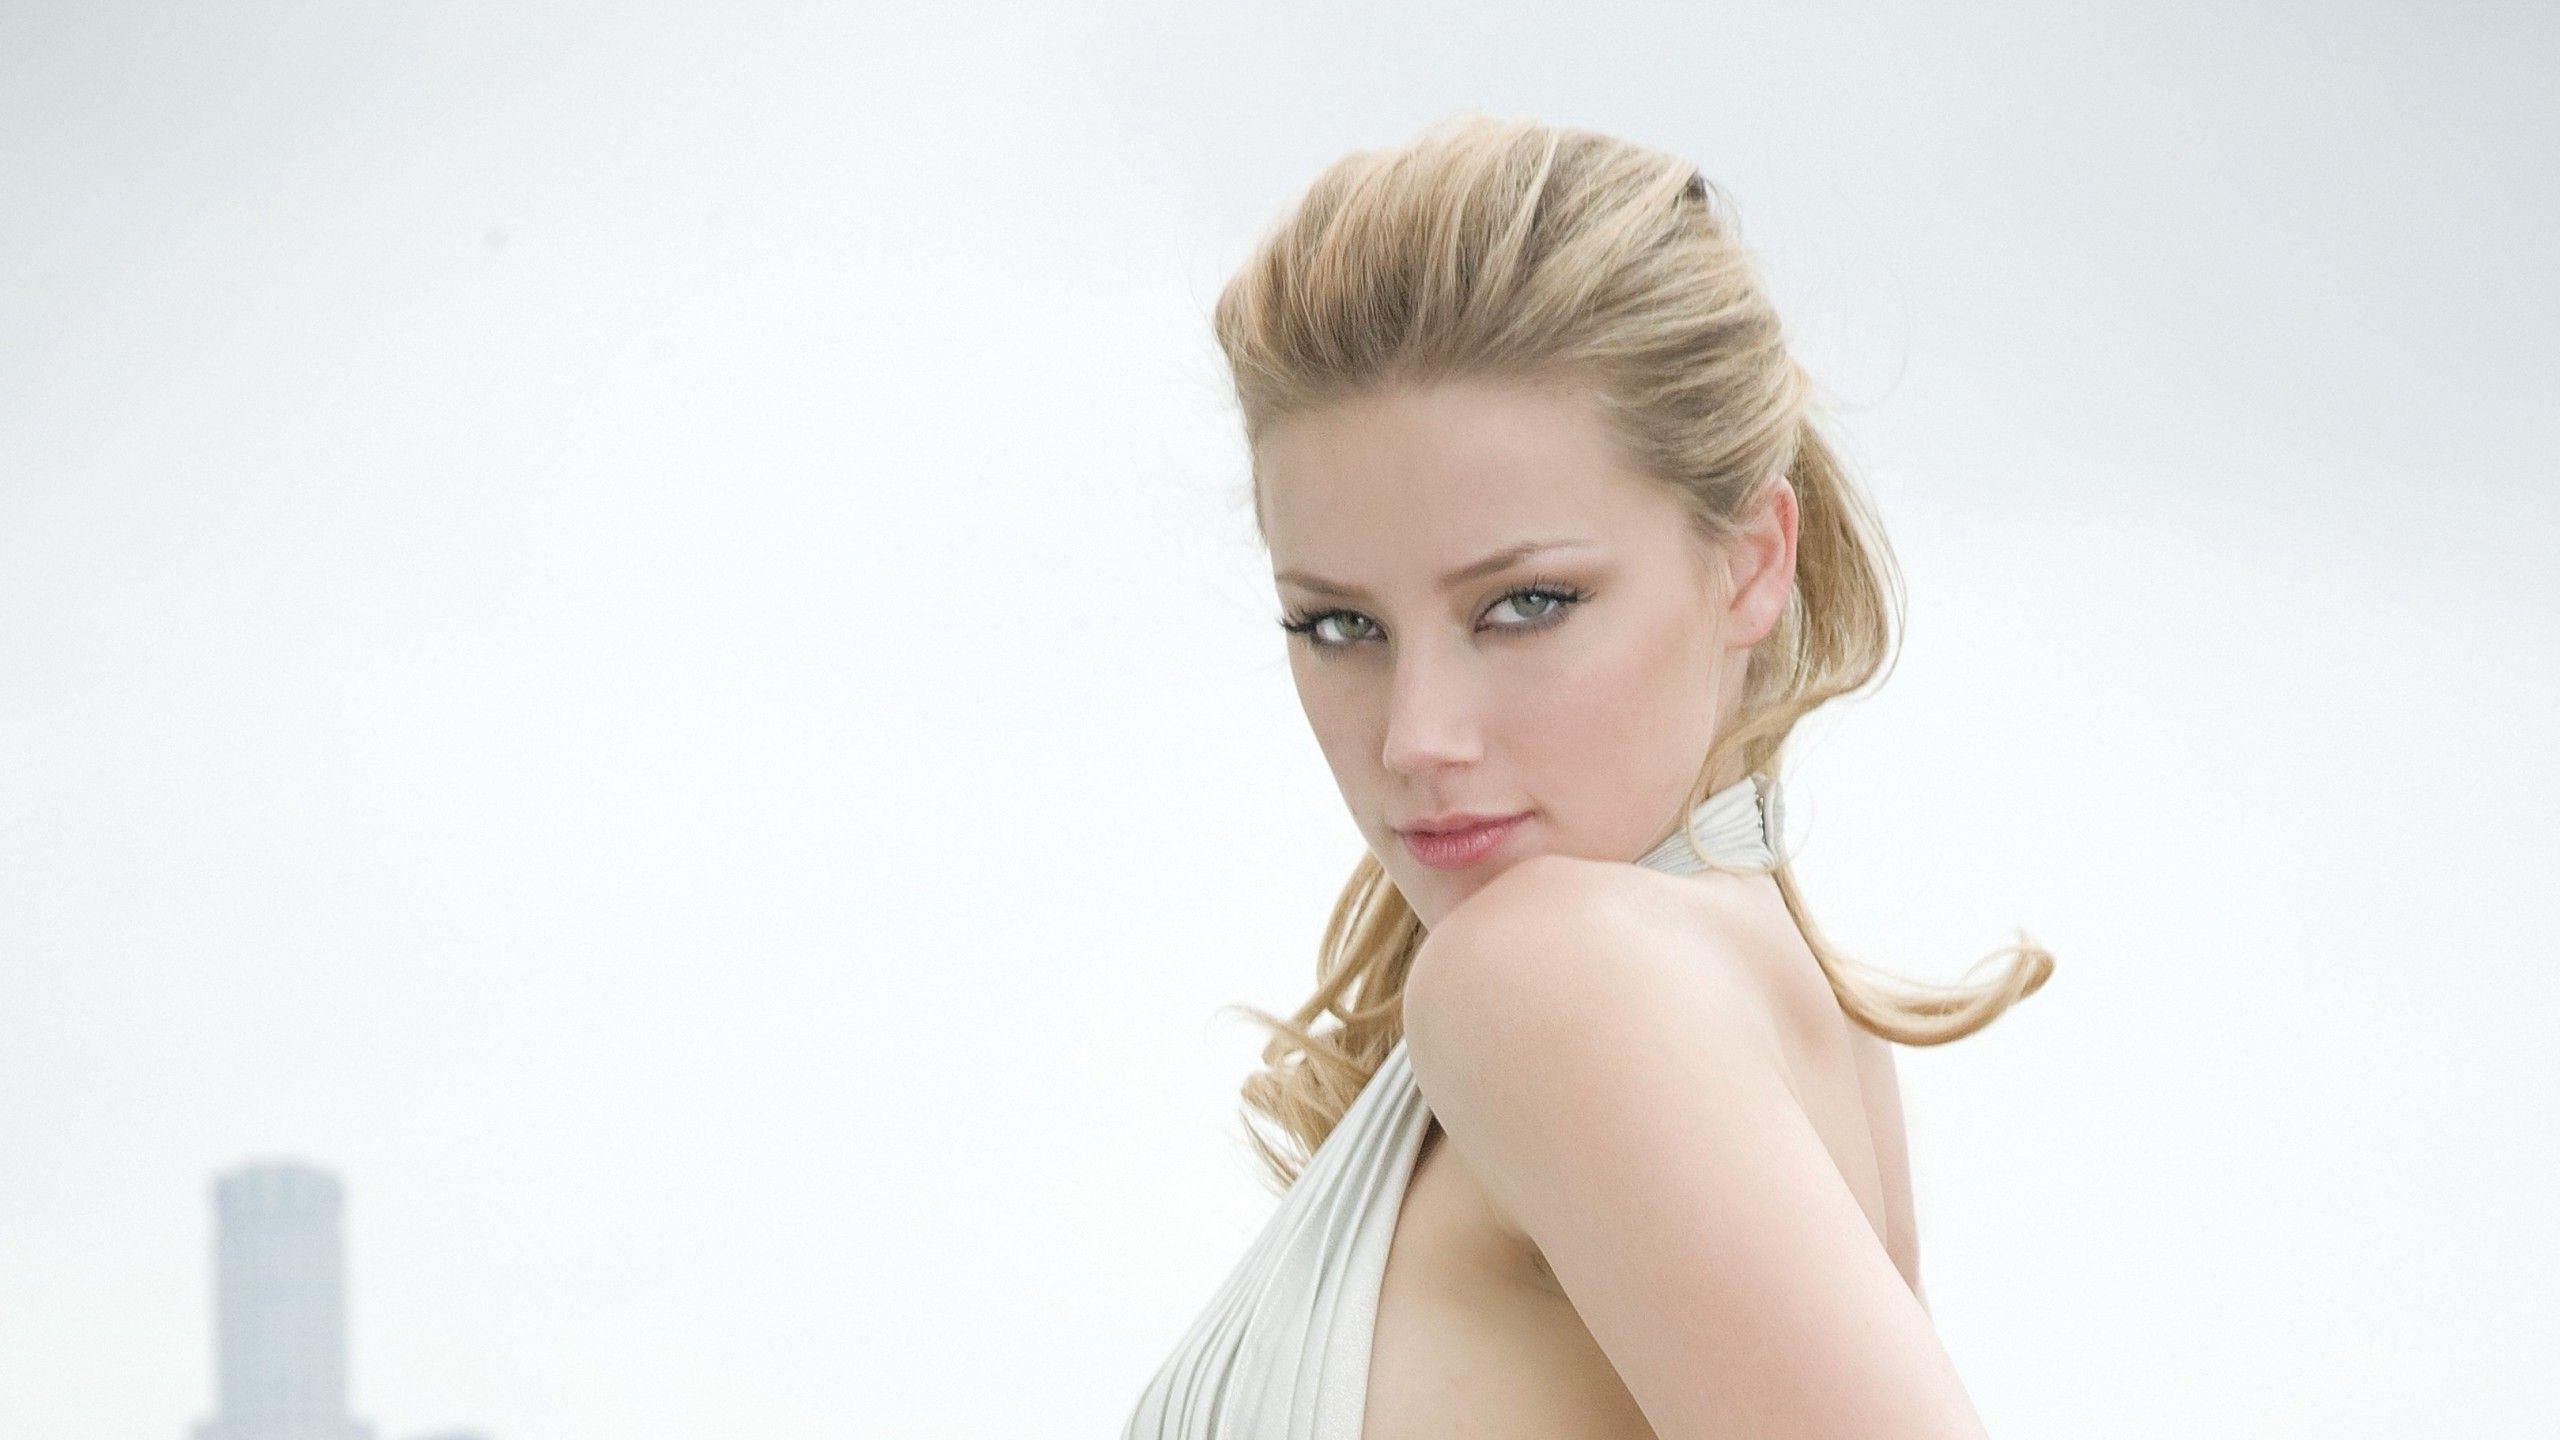 Amber Heard Blonde Blue Eyes Face Side View Wallpaper View Wallpaper Desktop Background Images Amber Heard